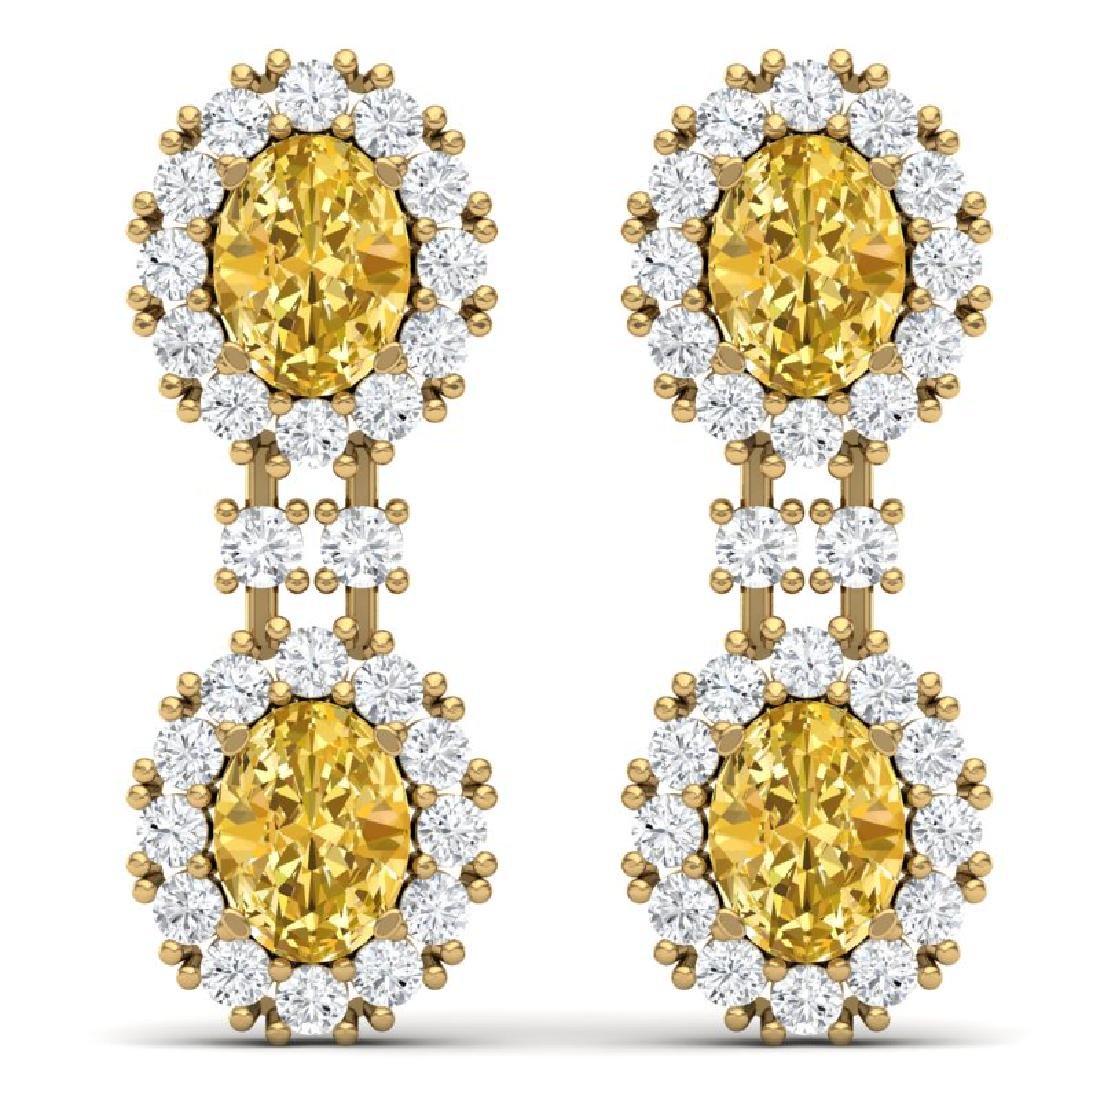 7.8 CTW Royalty Canary Citrine & VS Diamond Earrings